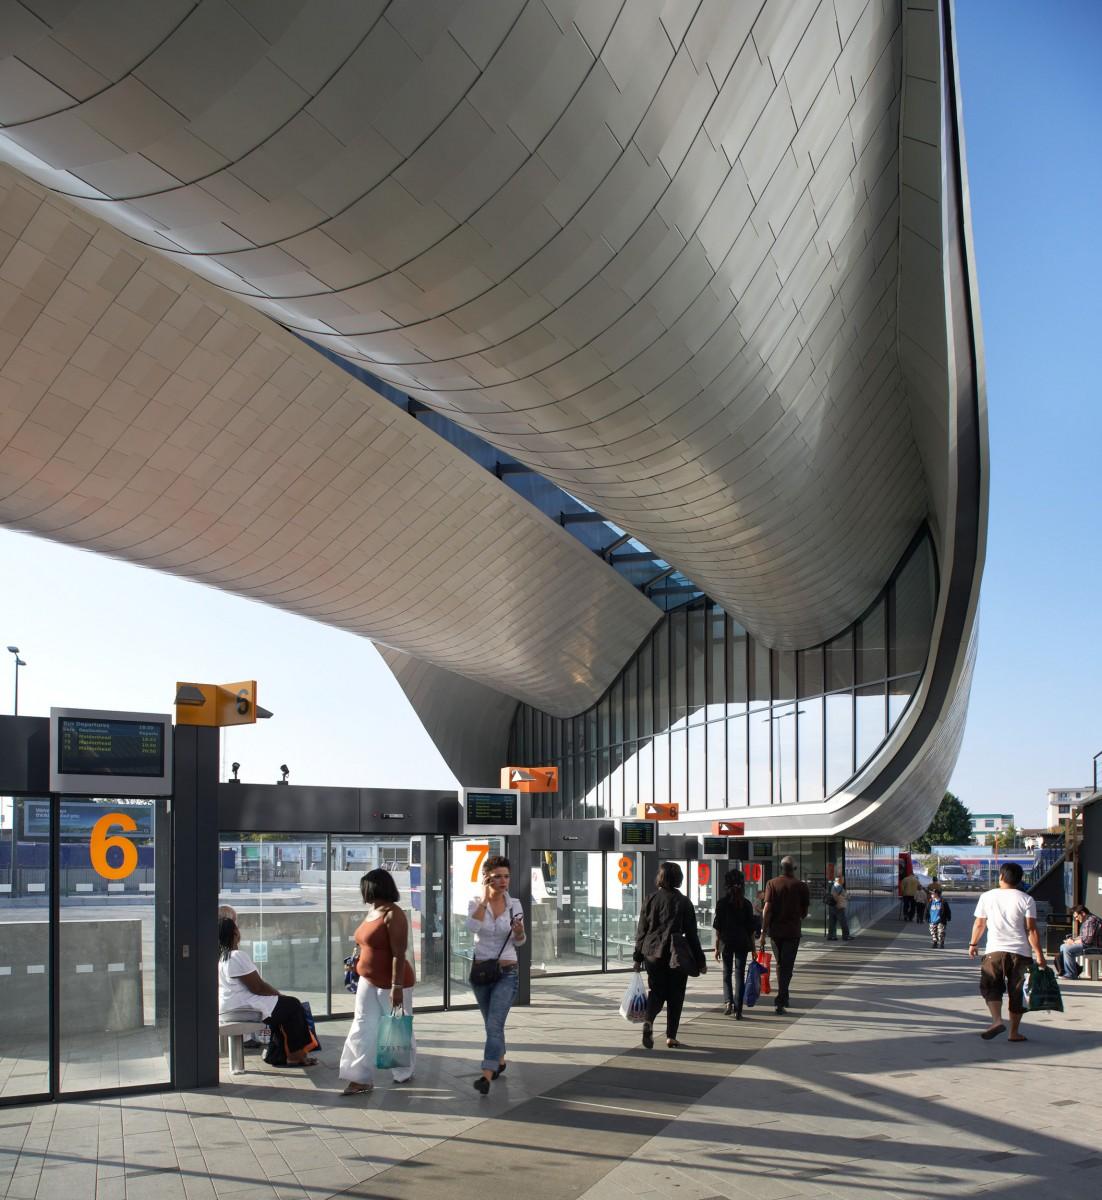 8129 slough bus station 07  Copyright Hufton + Crow